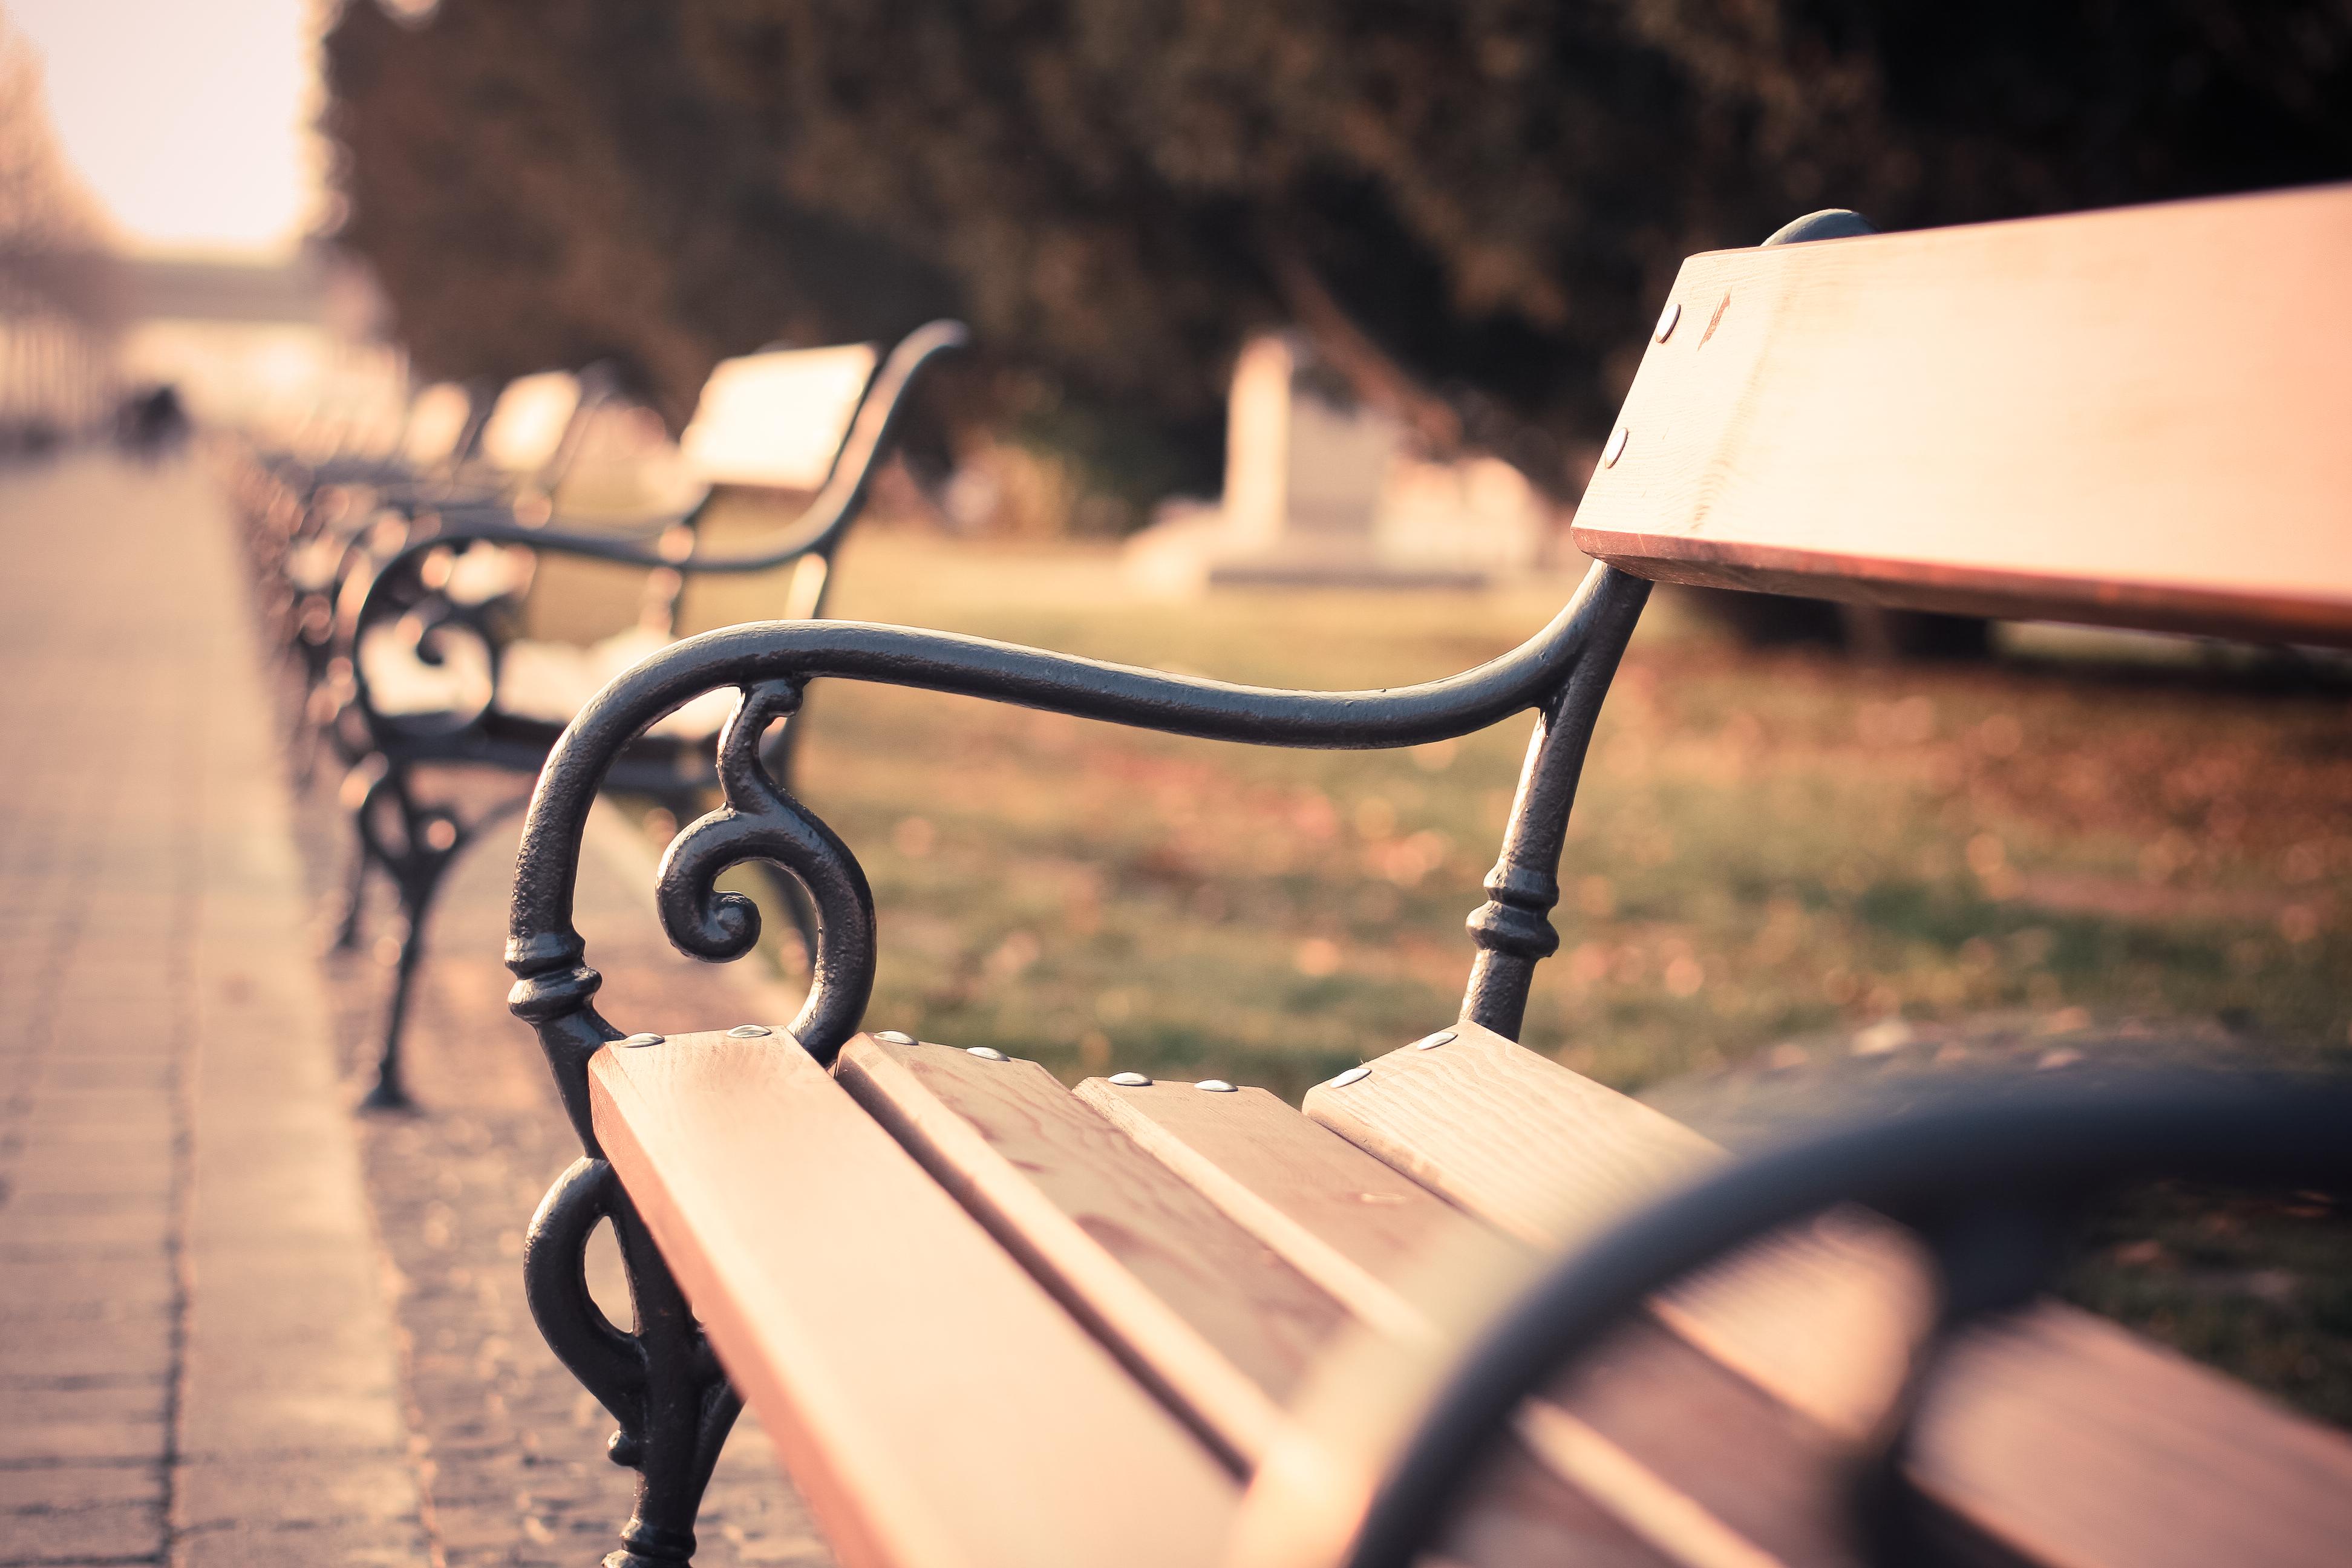 vintage-old-city-bench-picjumbo-com (2)